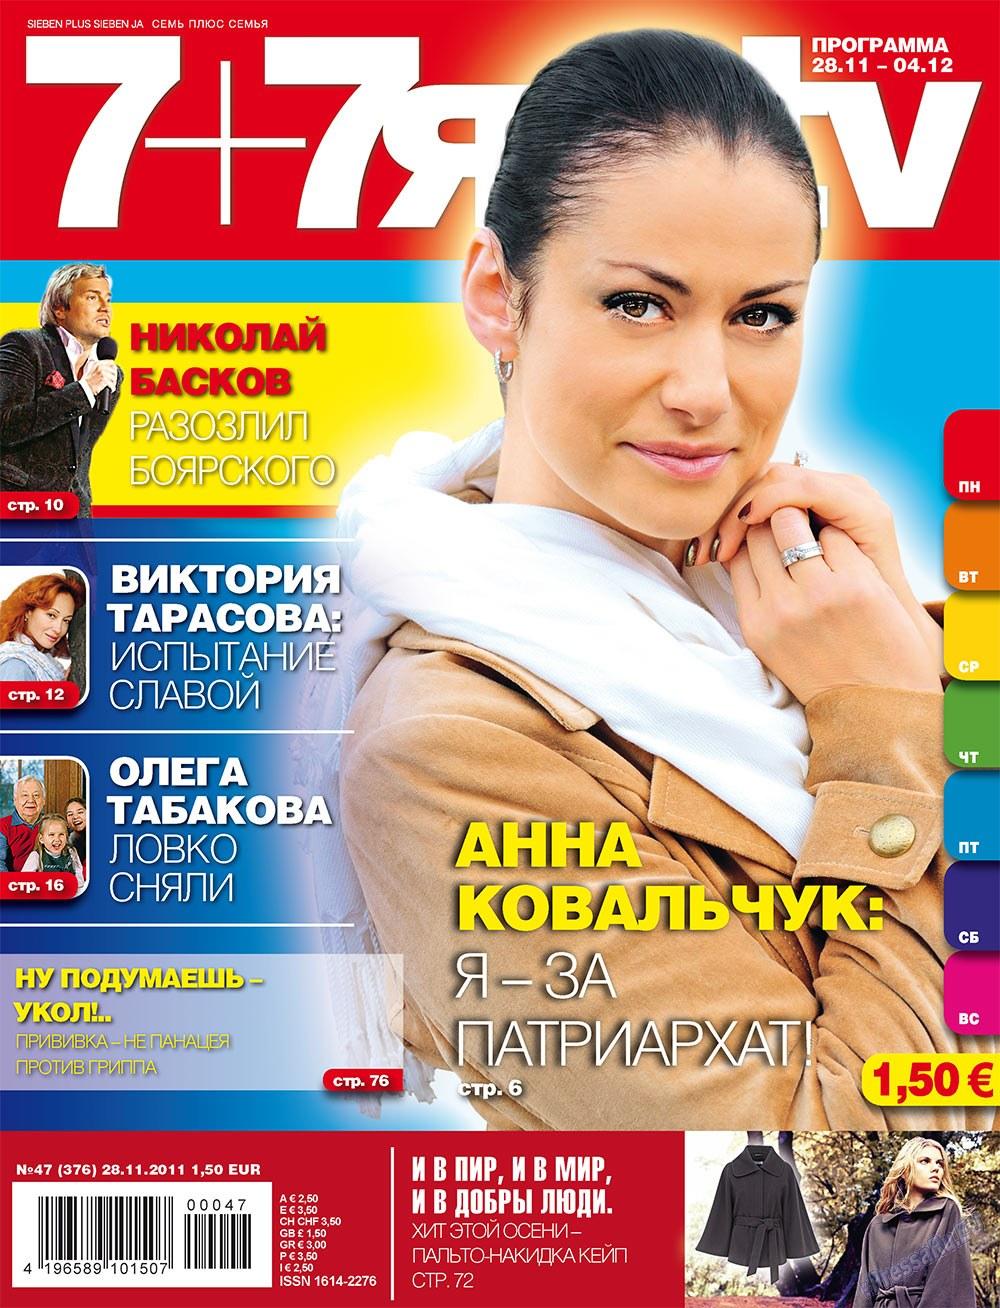 7плюс7я (журнал). 2011 год, номер 47, стр. 1